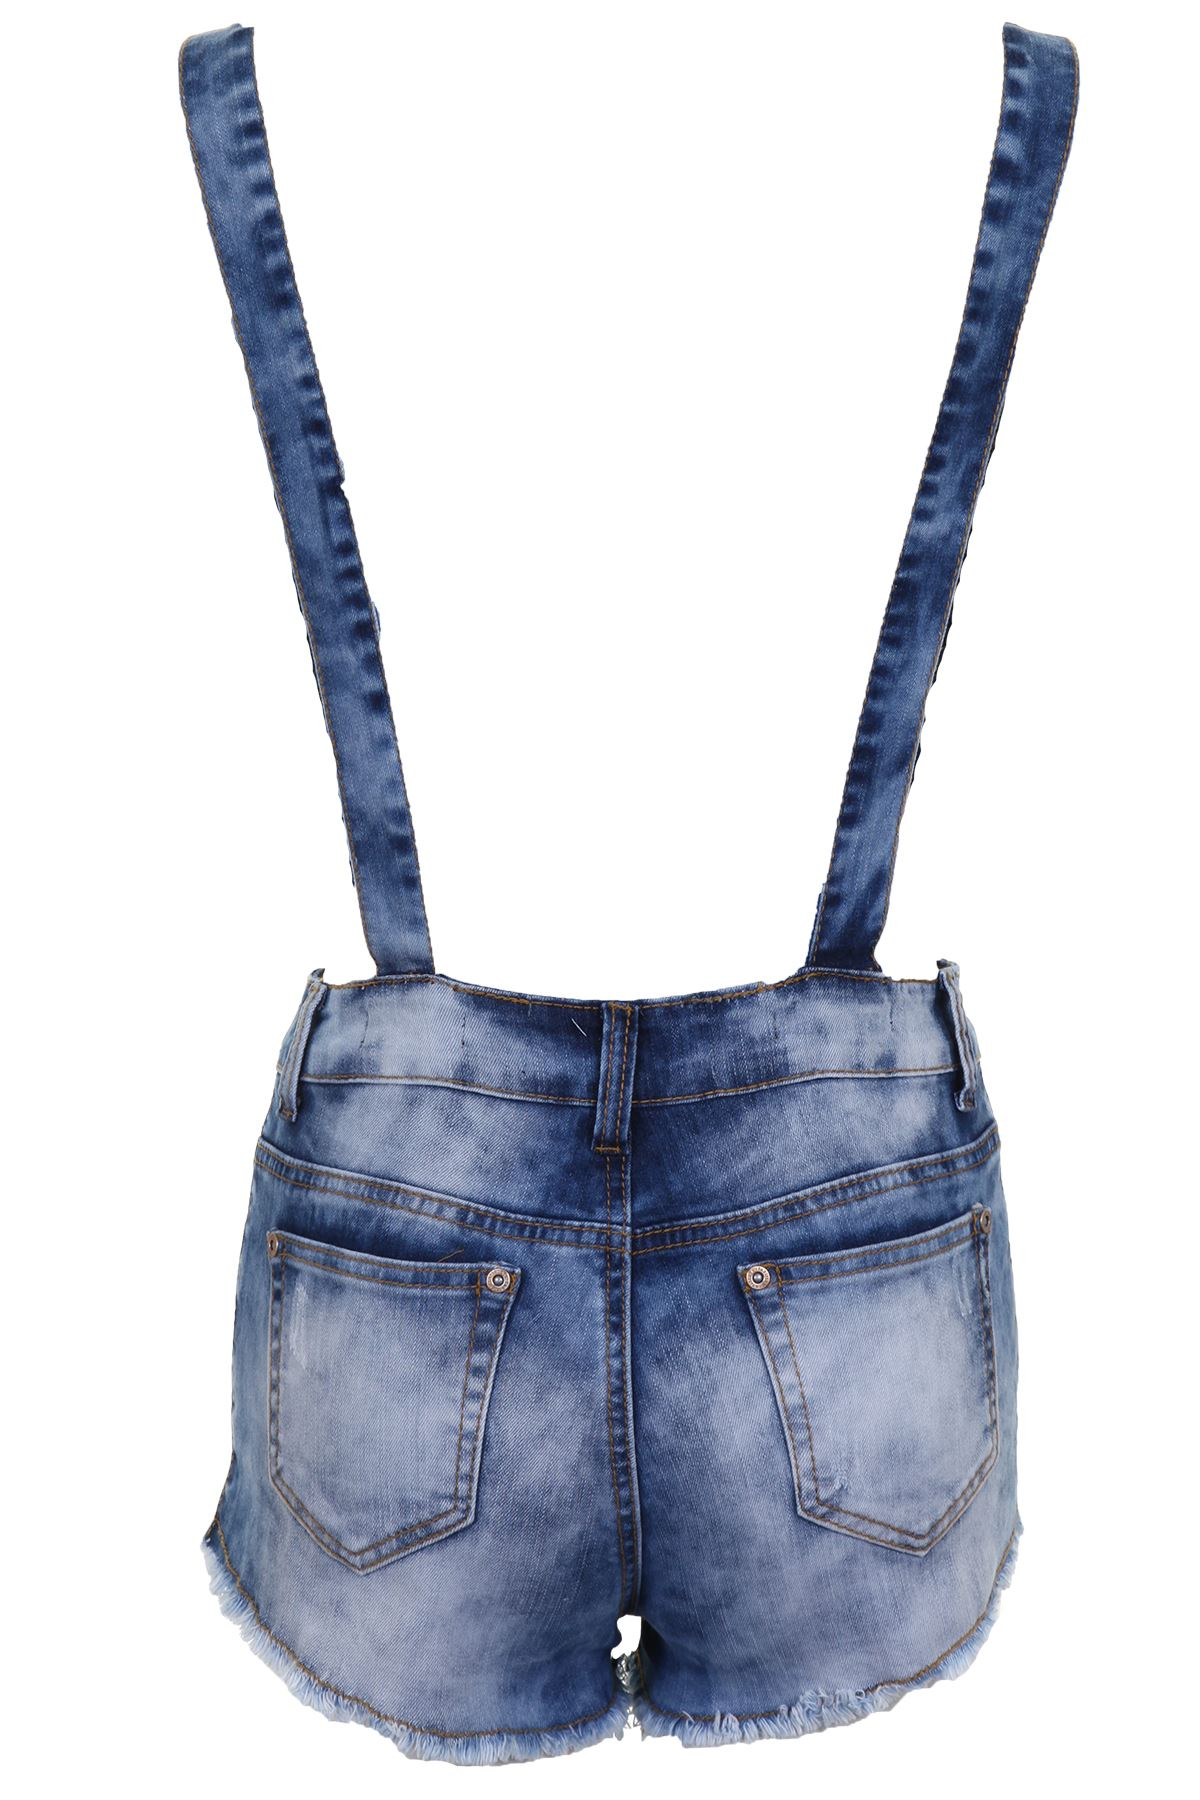 Womens-Distressed-Denim-Brace-Frayed-Summer-Causal-Ladies-Shorts-Dungarees